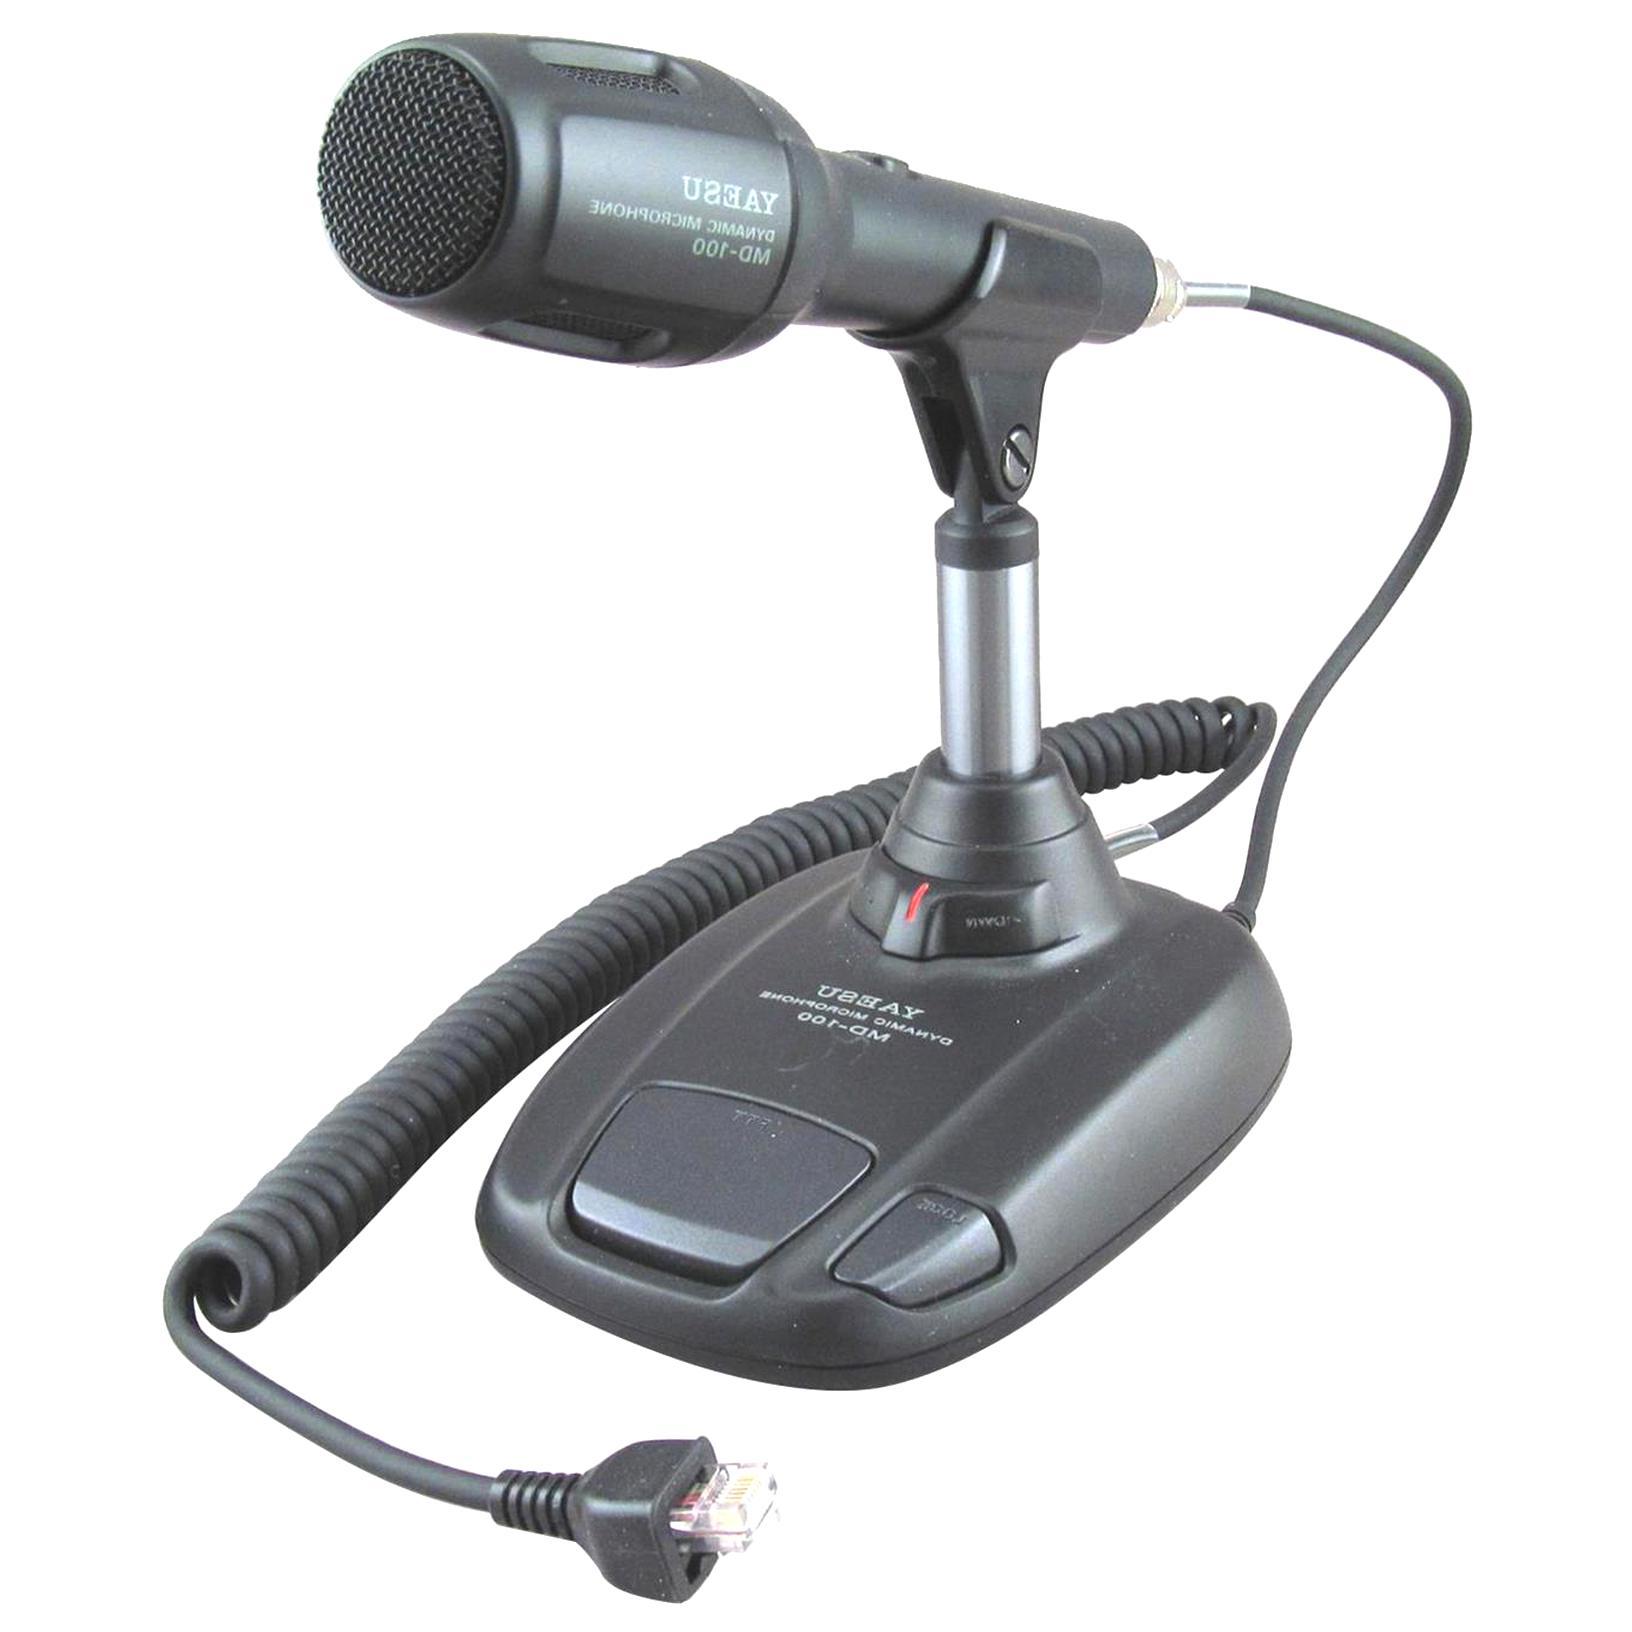 yaesu desk microphone for sale